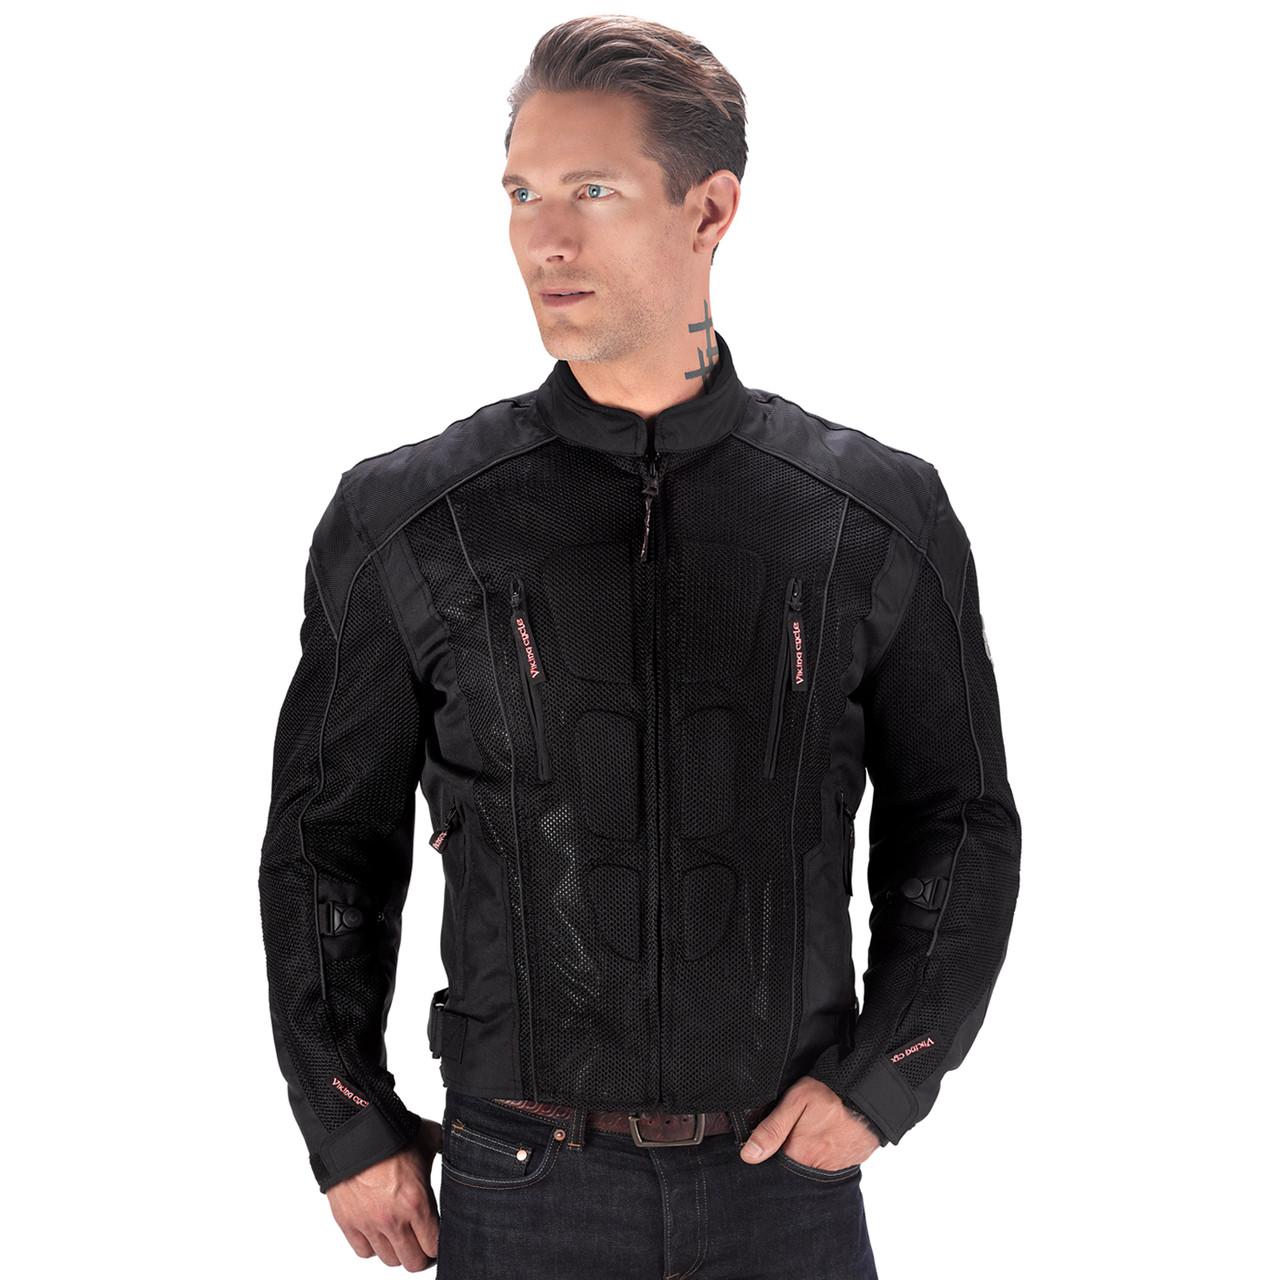 Vikingcycle Warlock Mesh Motorcycle Jacket For Men Motorcycle